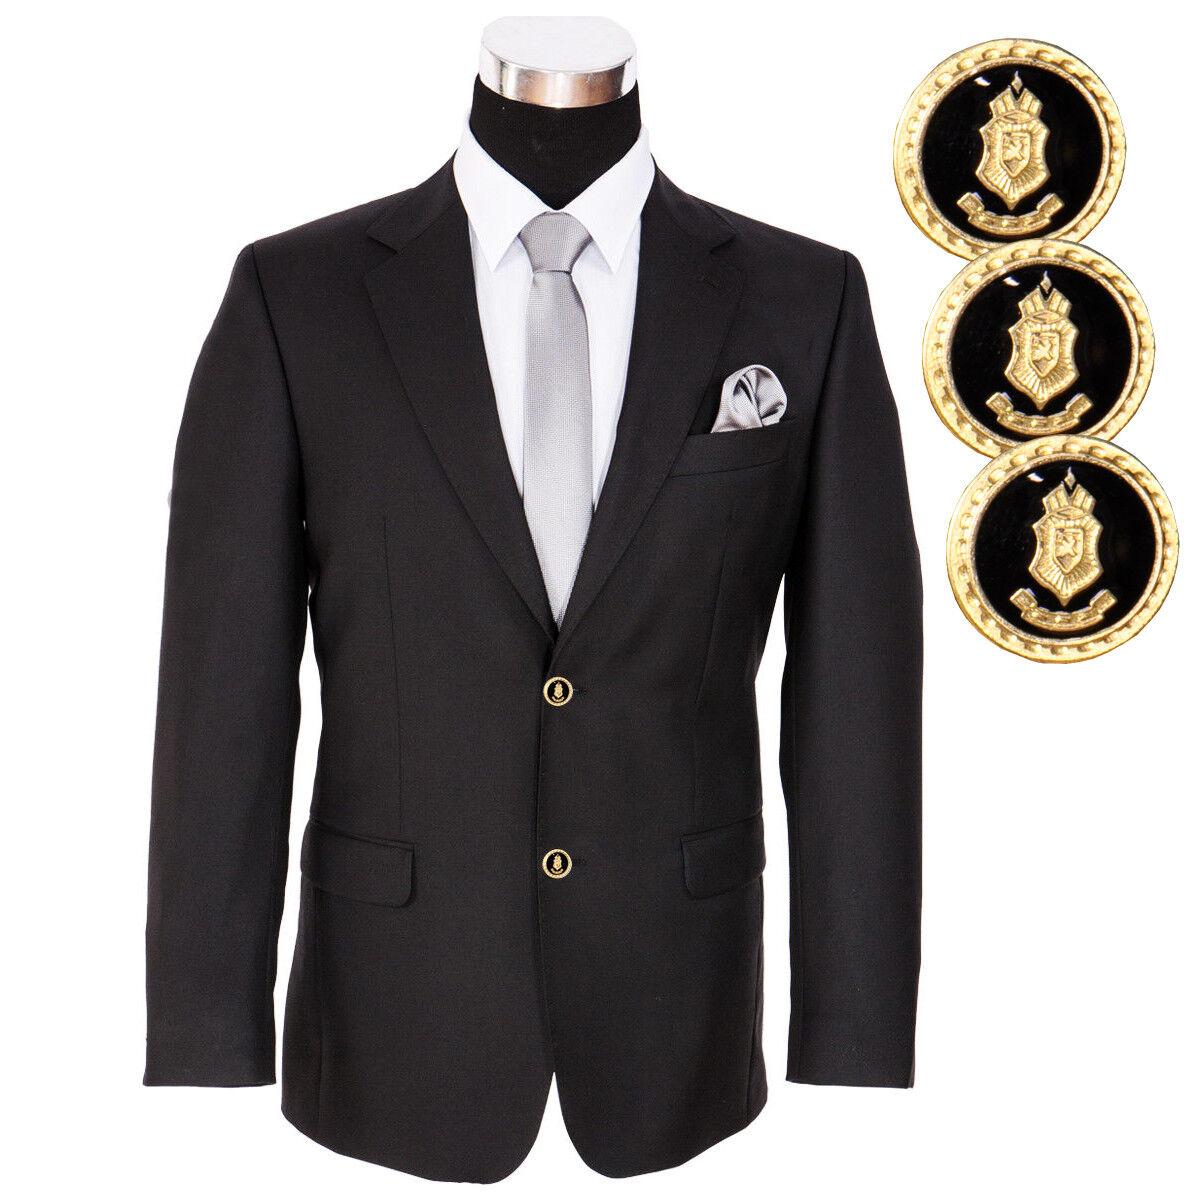 Uomo Giacca da Uomo Giacca business Club srotolati business Giacca Mode Misure Grandi Tg. 36,72,114,126 d94088